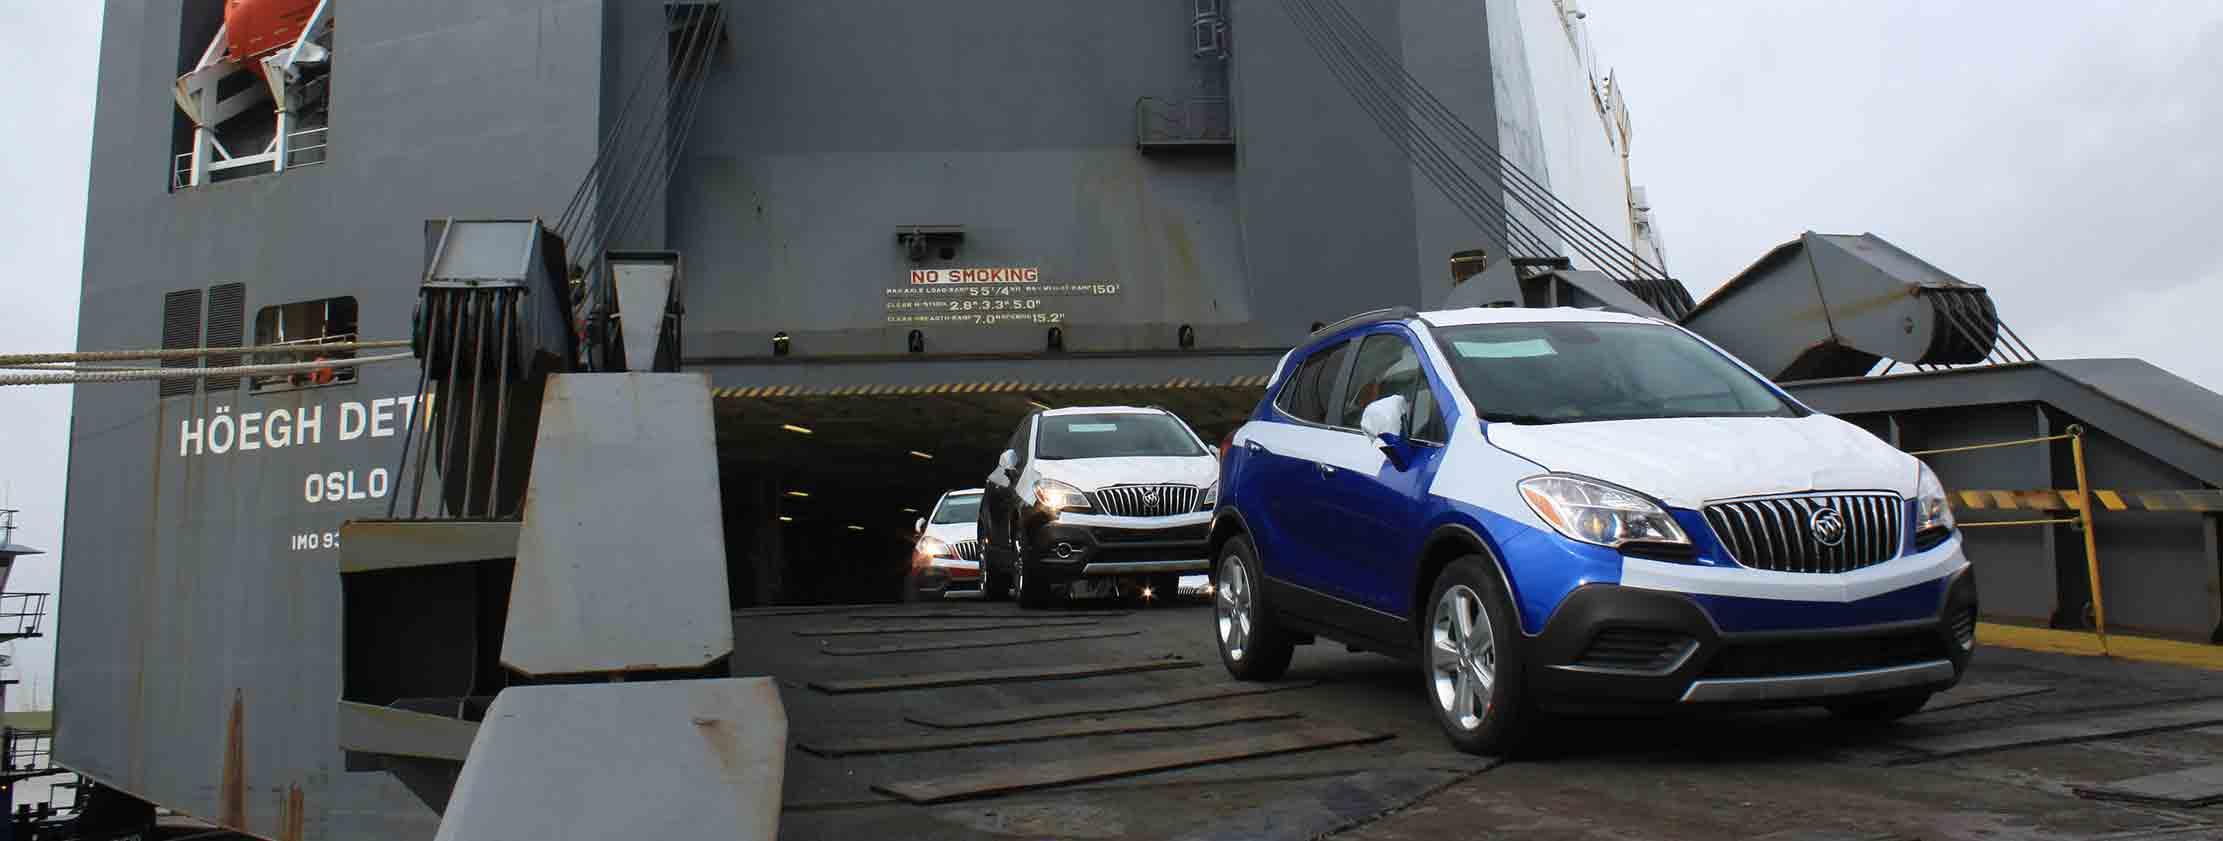 port freeport roll on/off terminal